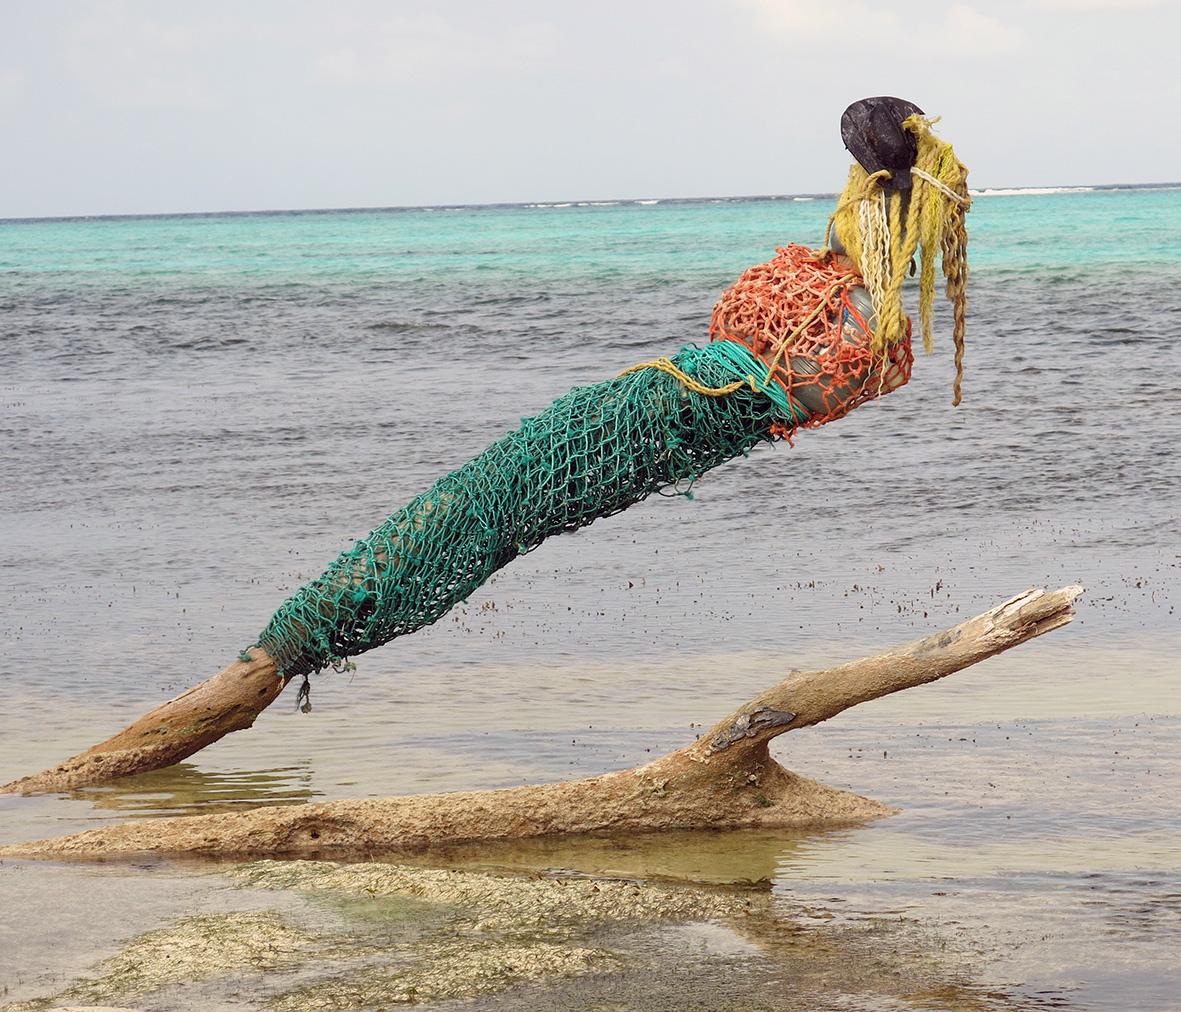 Xcalak Mermaid